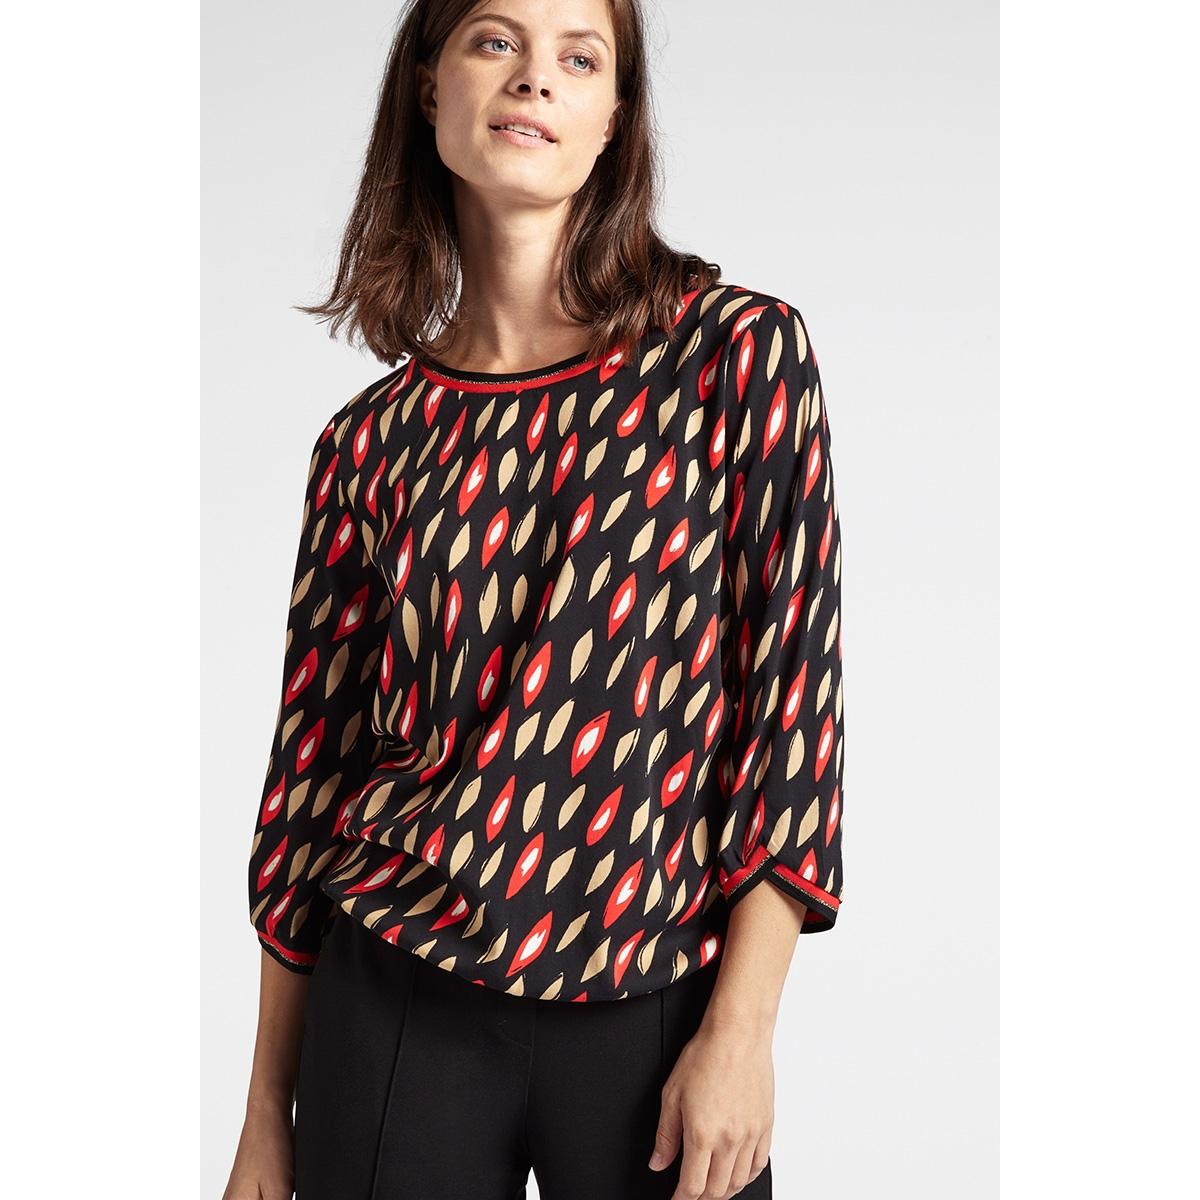 blouse met grafische print 22001789 sandwich blouse 20151 red